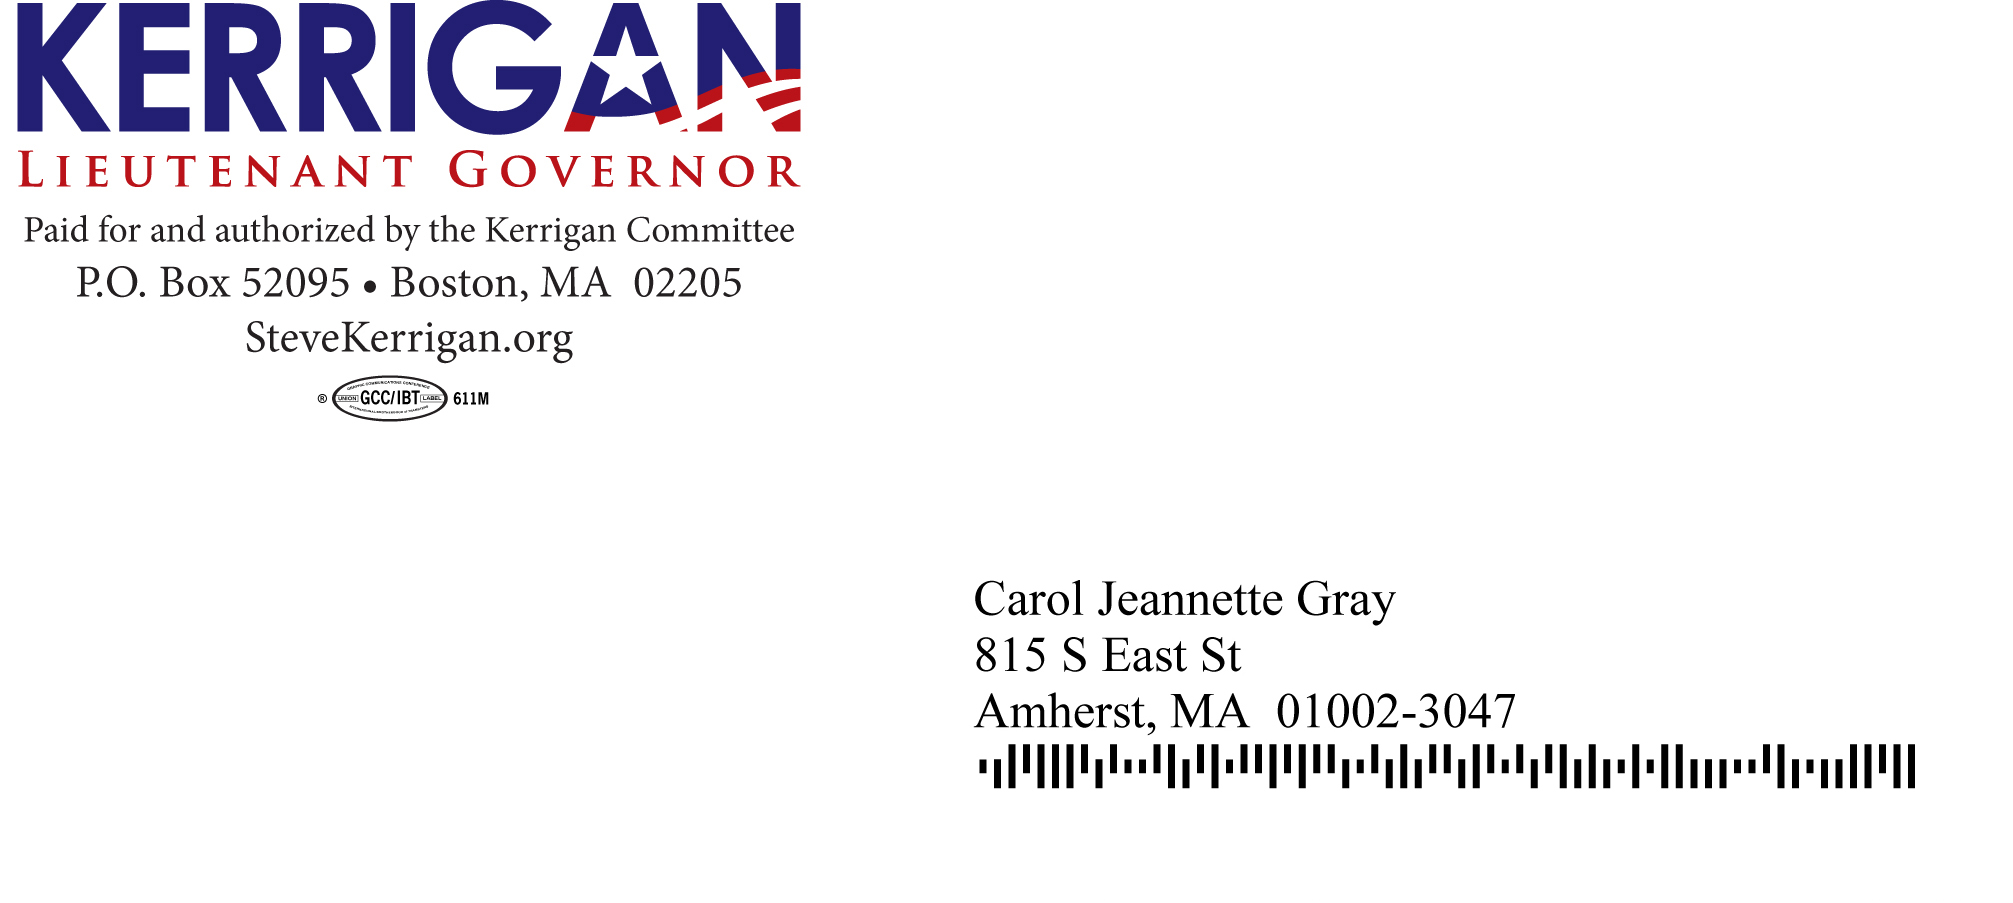 Mailing 1 Envelope